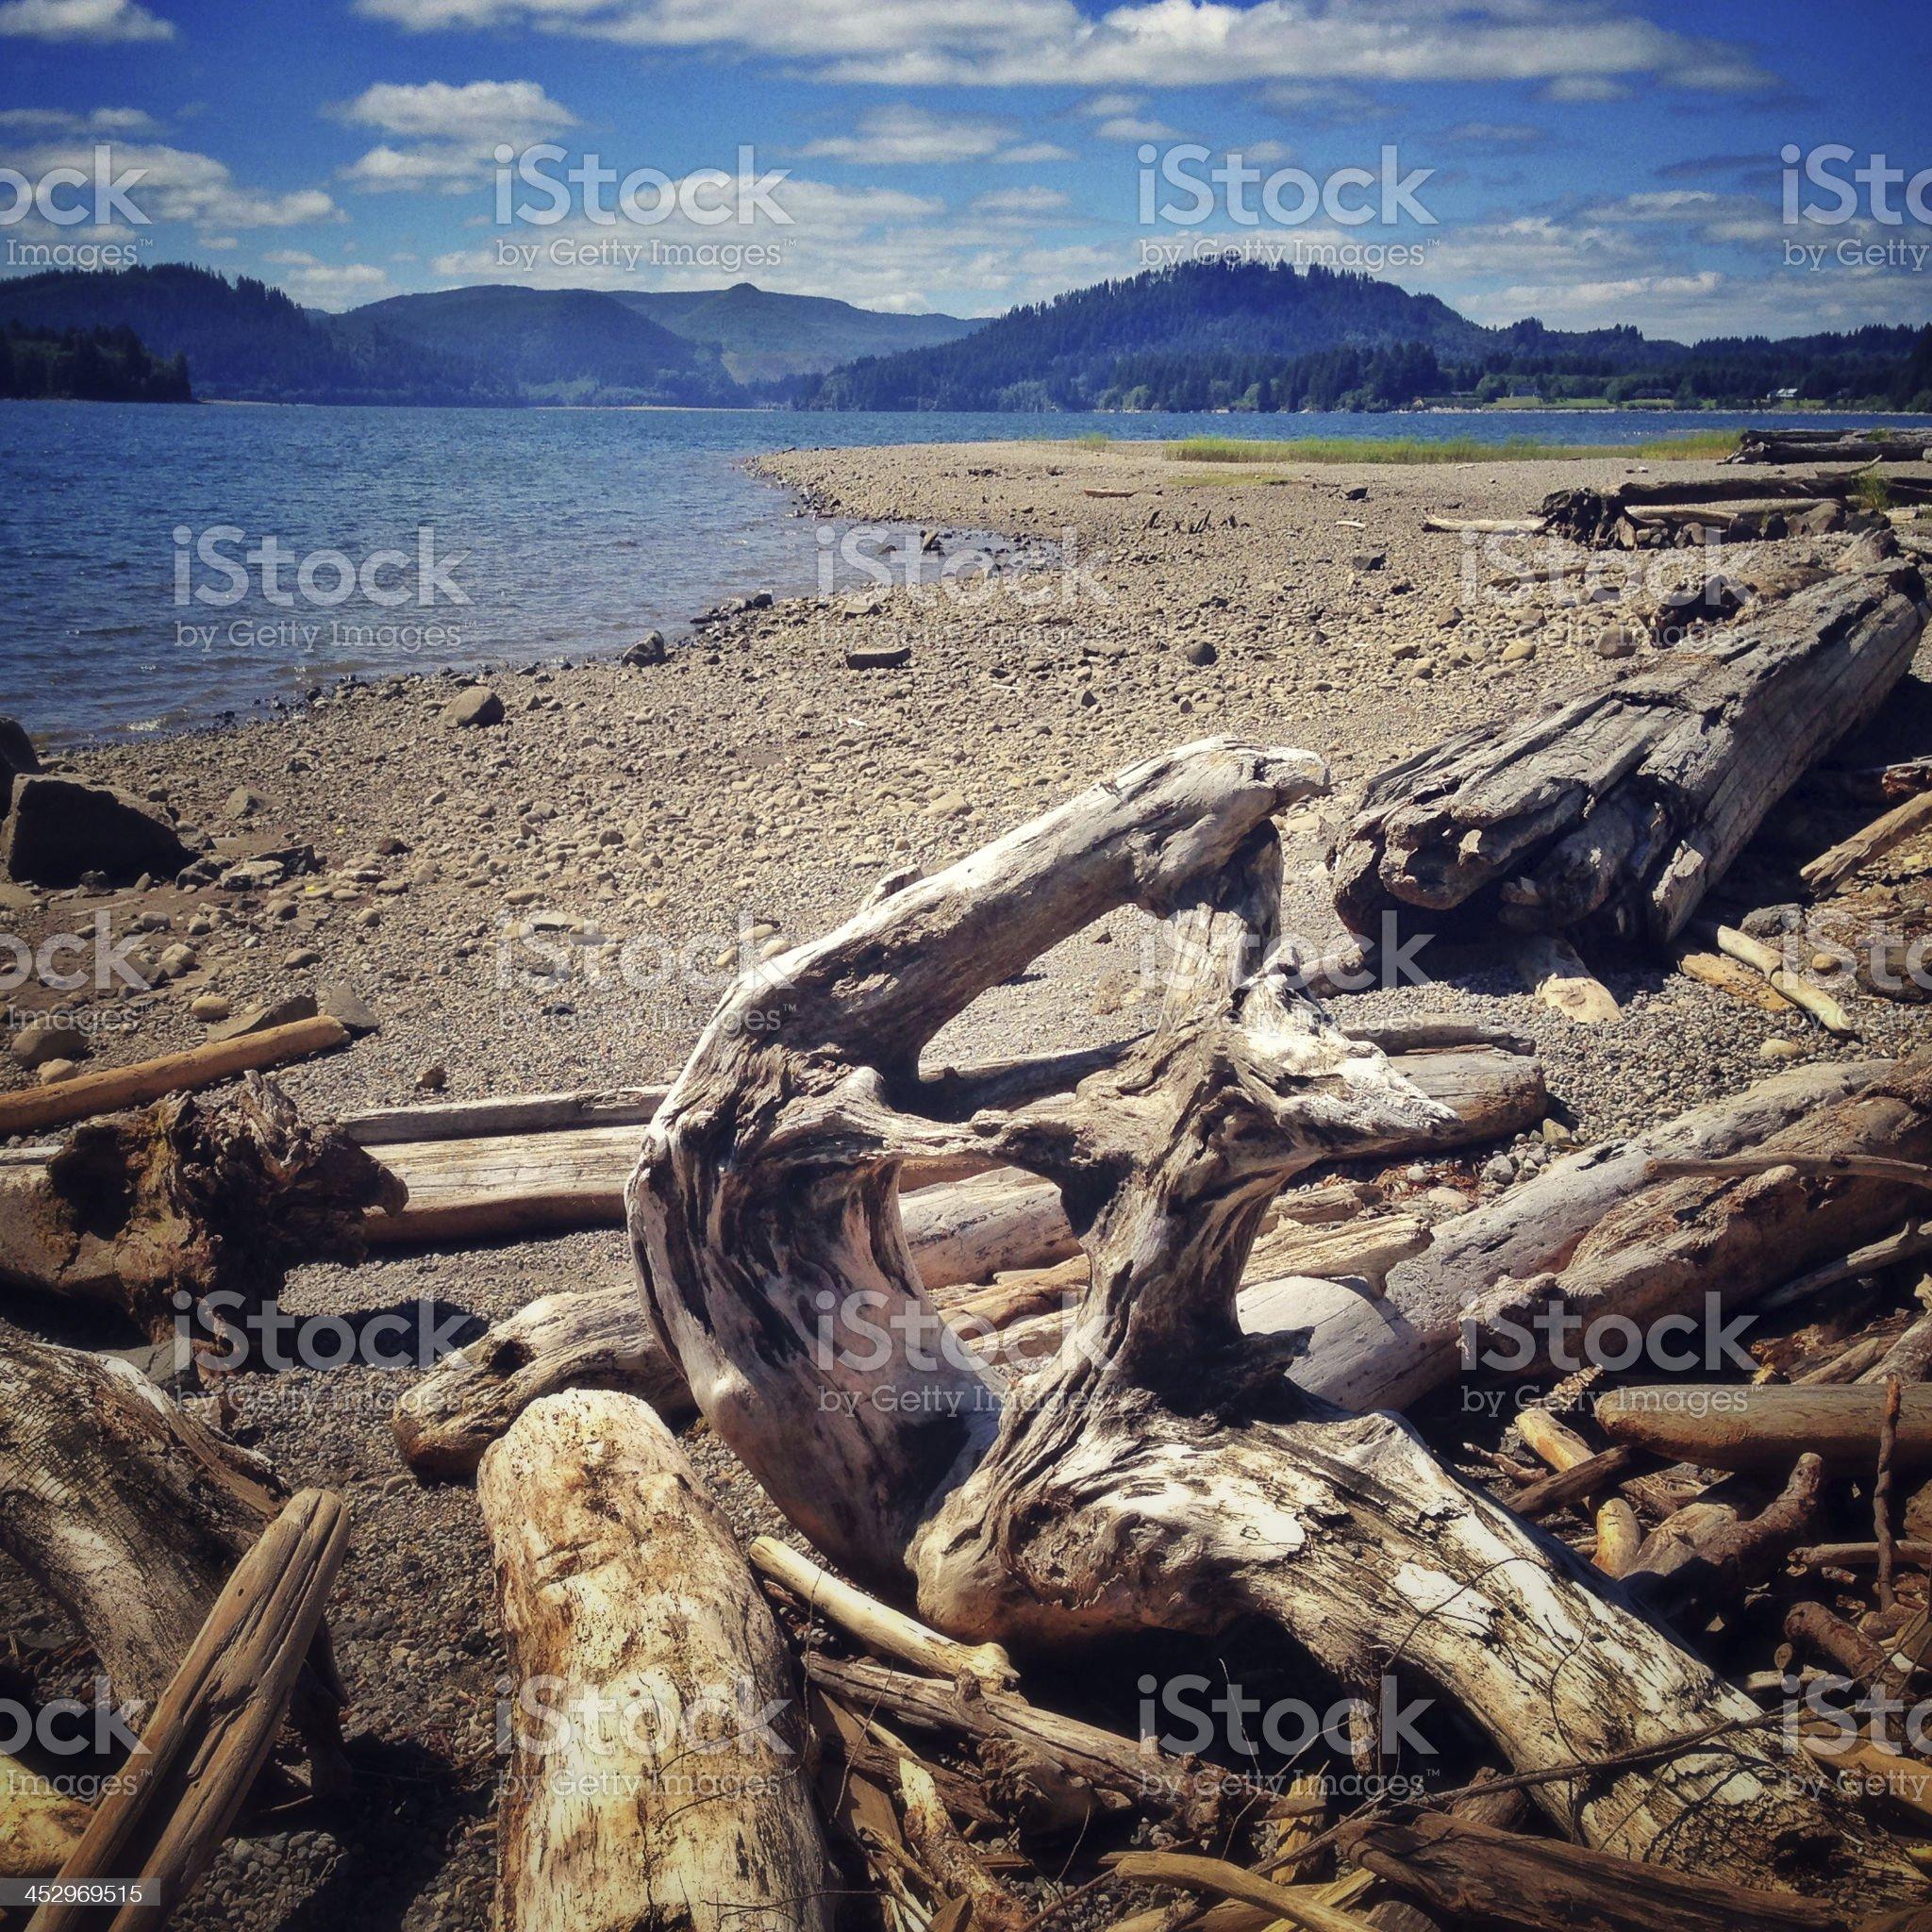 Wood debris on the lake shore royalty-free stock photo